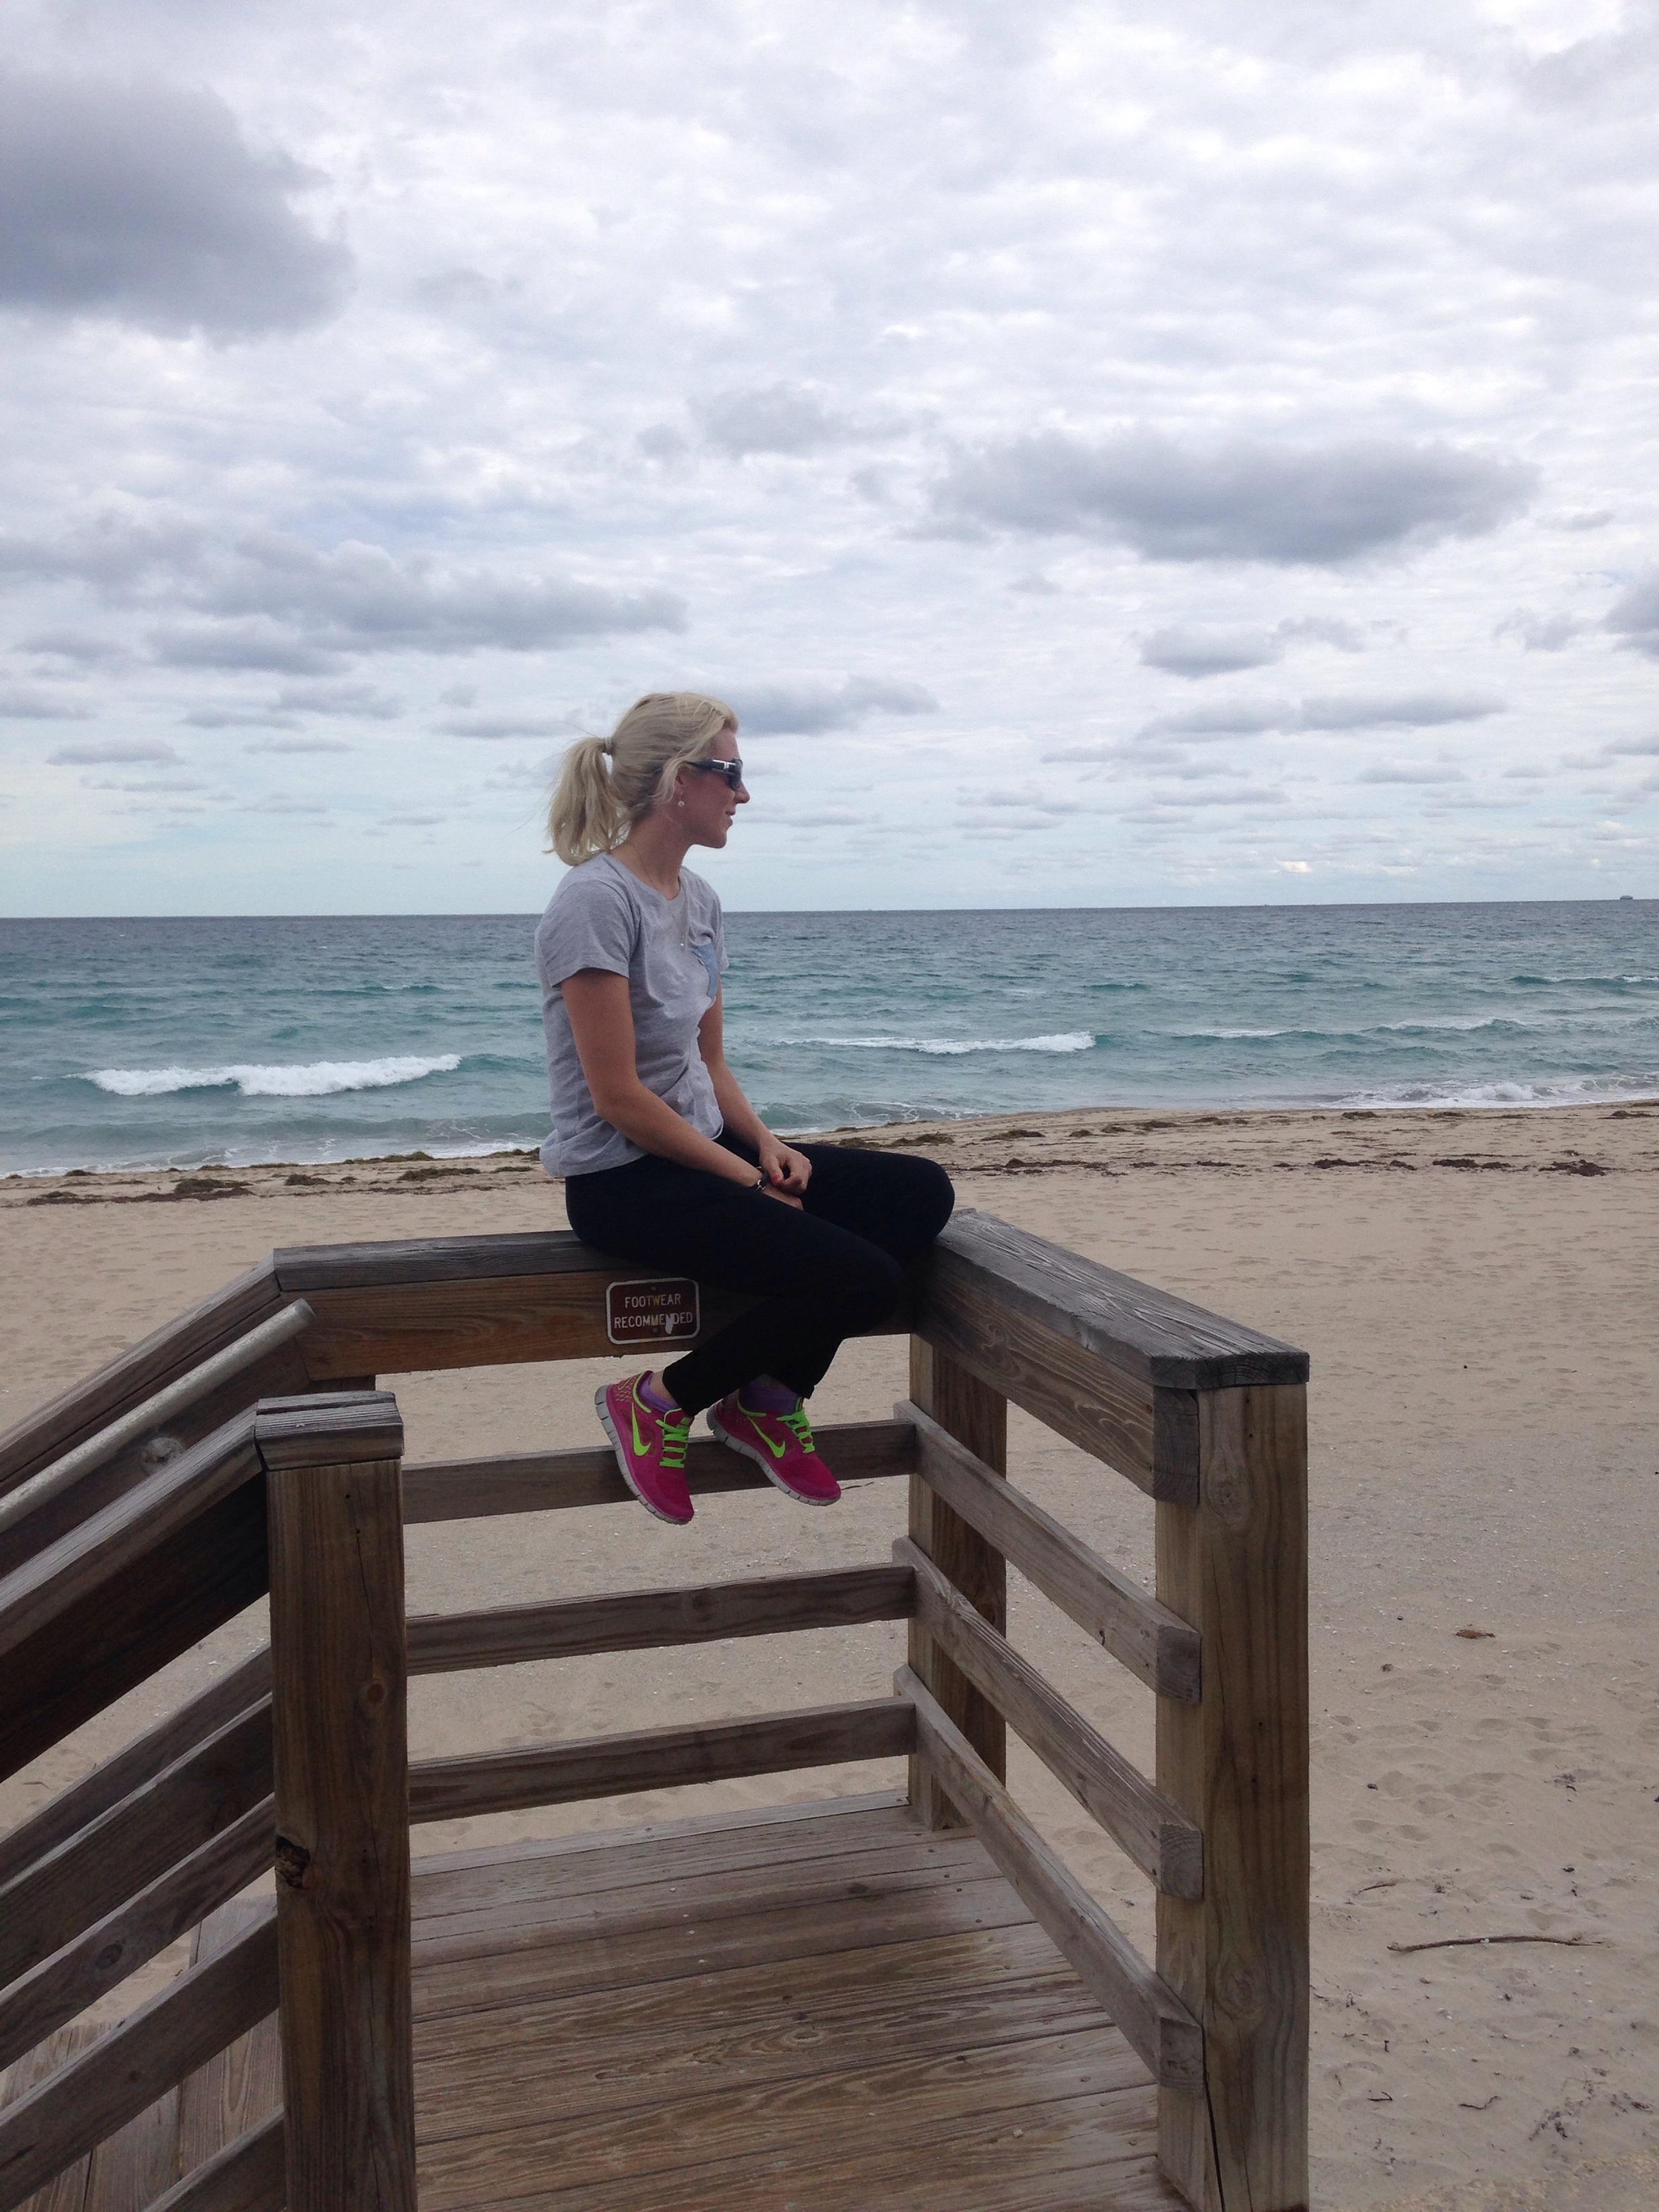 Palm beach, inte så jättevarmt just denna dag